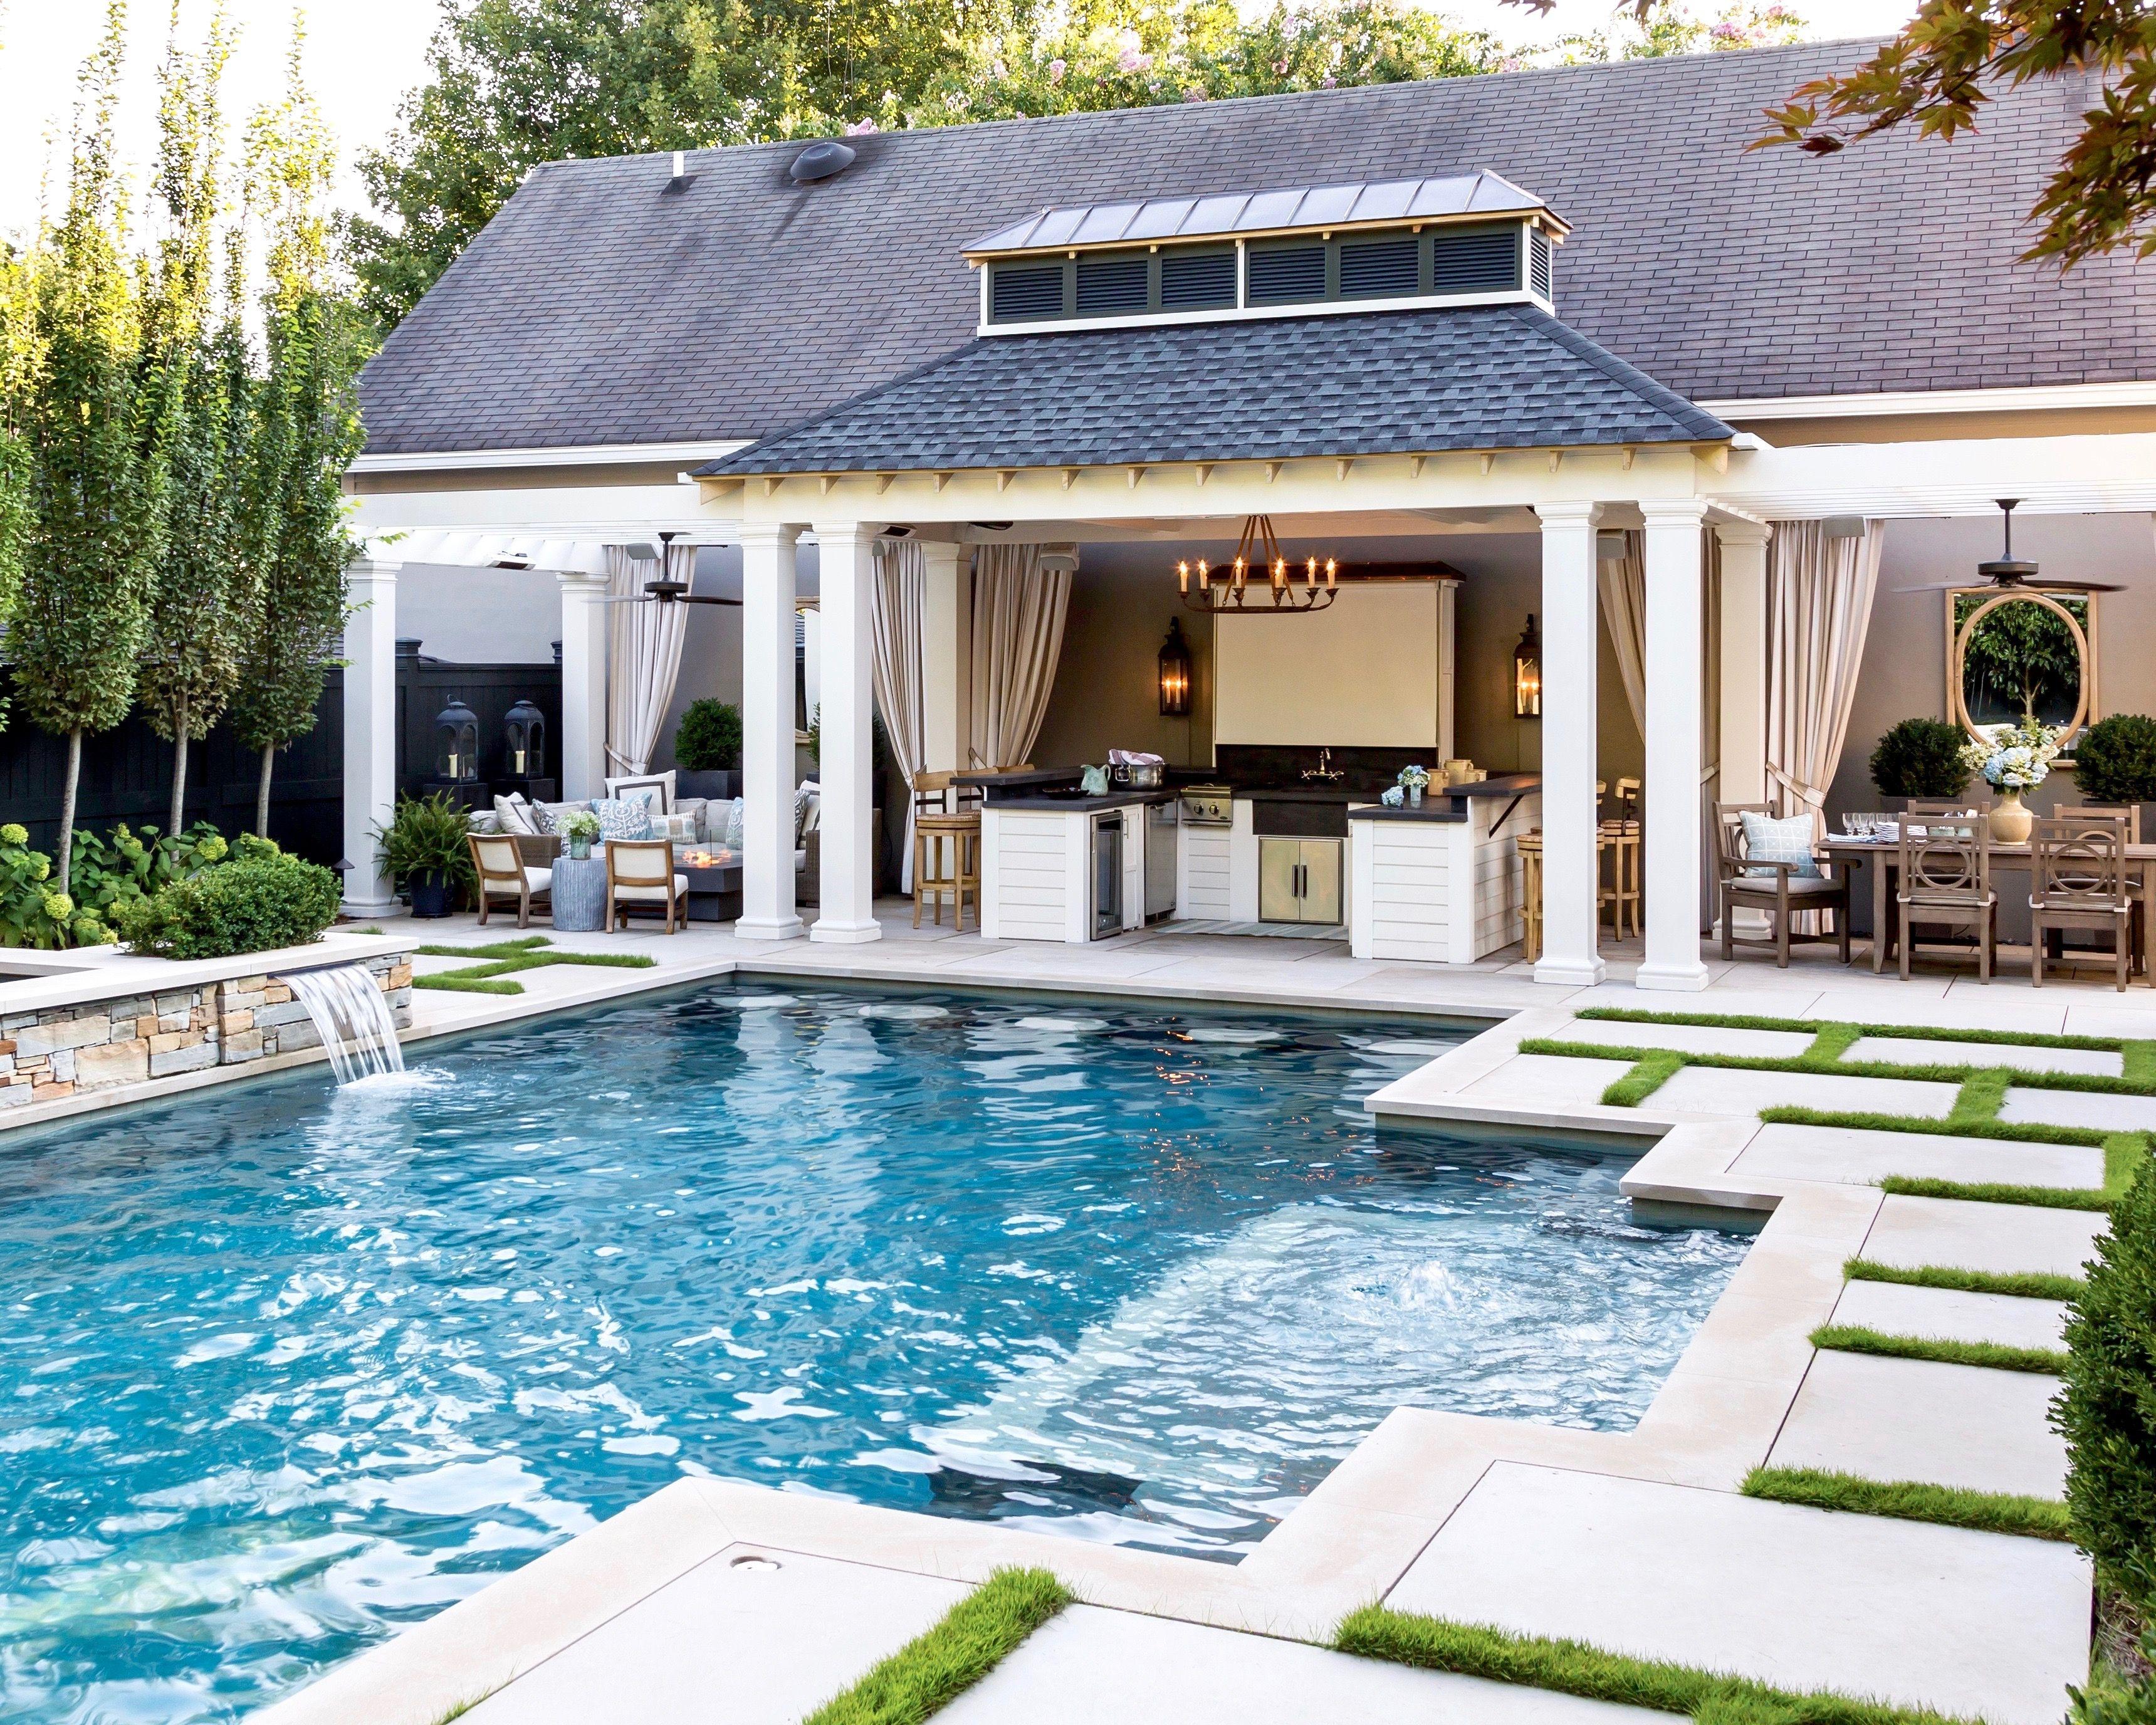 July August 2017 Southern Lady Magazine Pool Houses Backyard Pool Designs Backyard Pool Landscaping